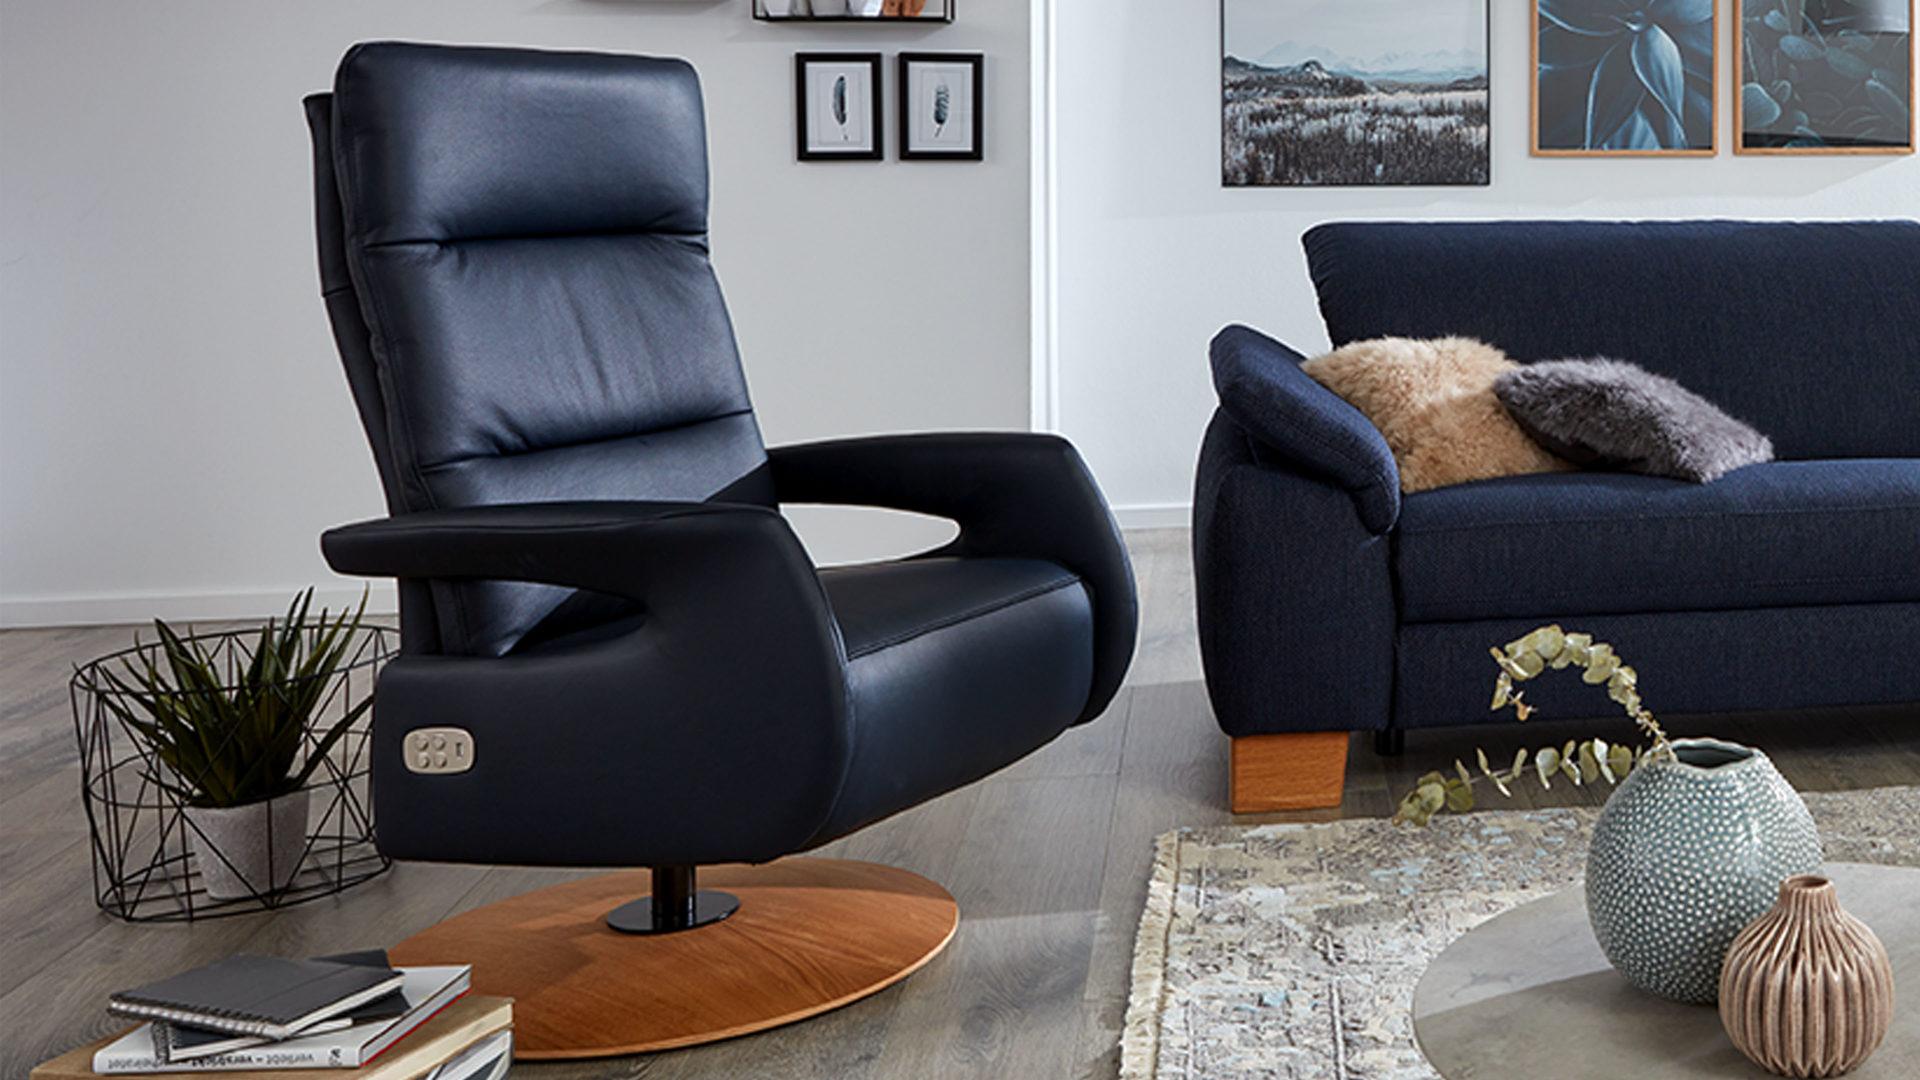 cb74280350bbc5 Interliving Sessel Serie 4510 – Relaxsessel